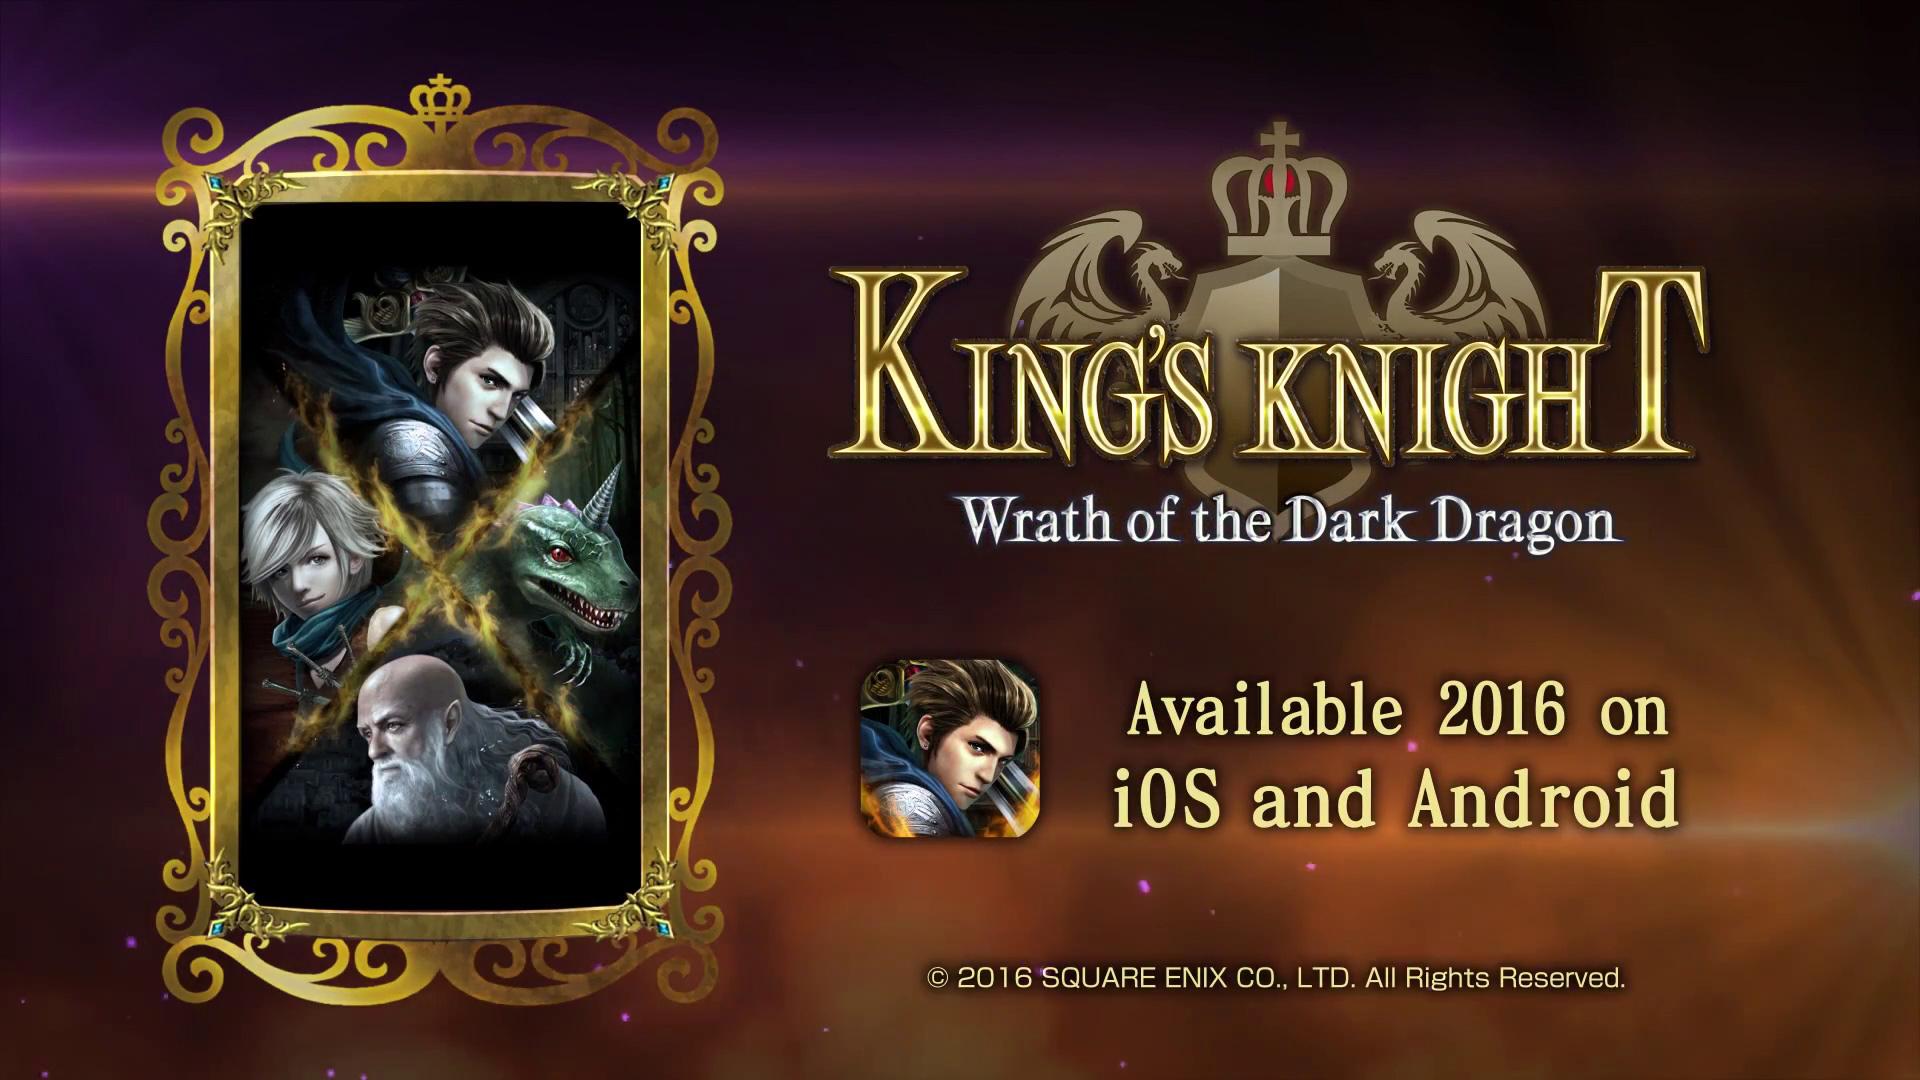 kings-knight-wrath-of-the-dark-dragon-gamesoul-01